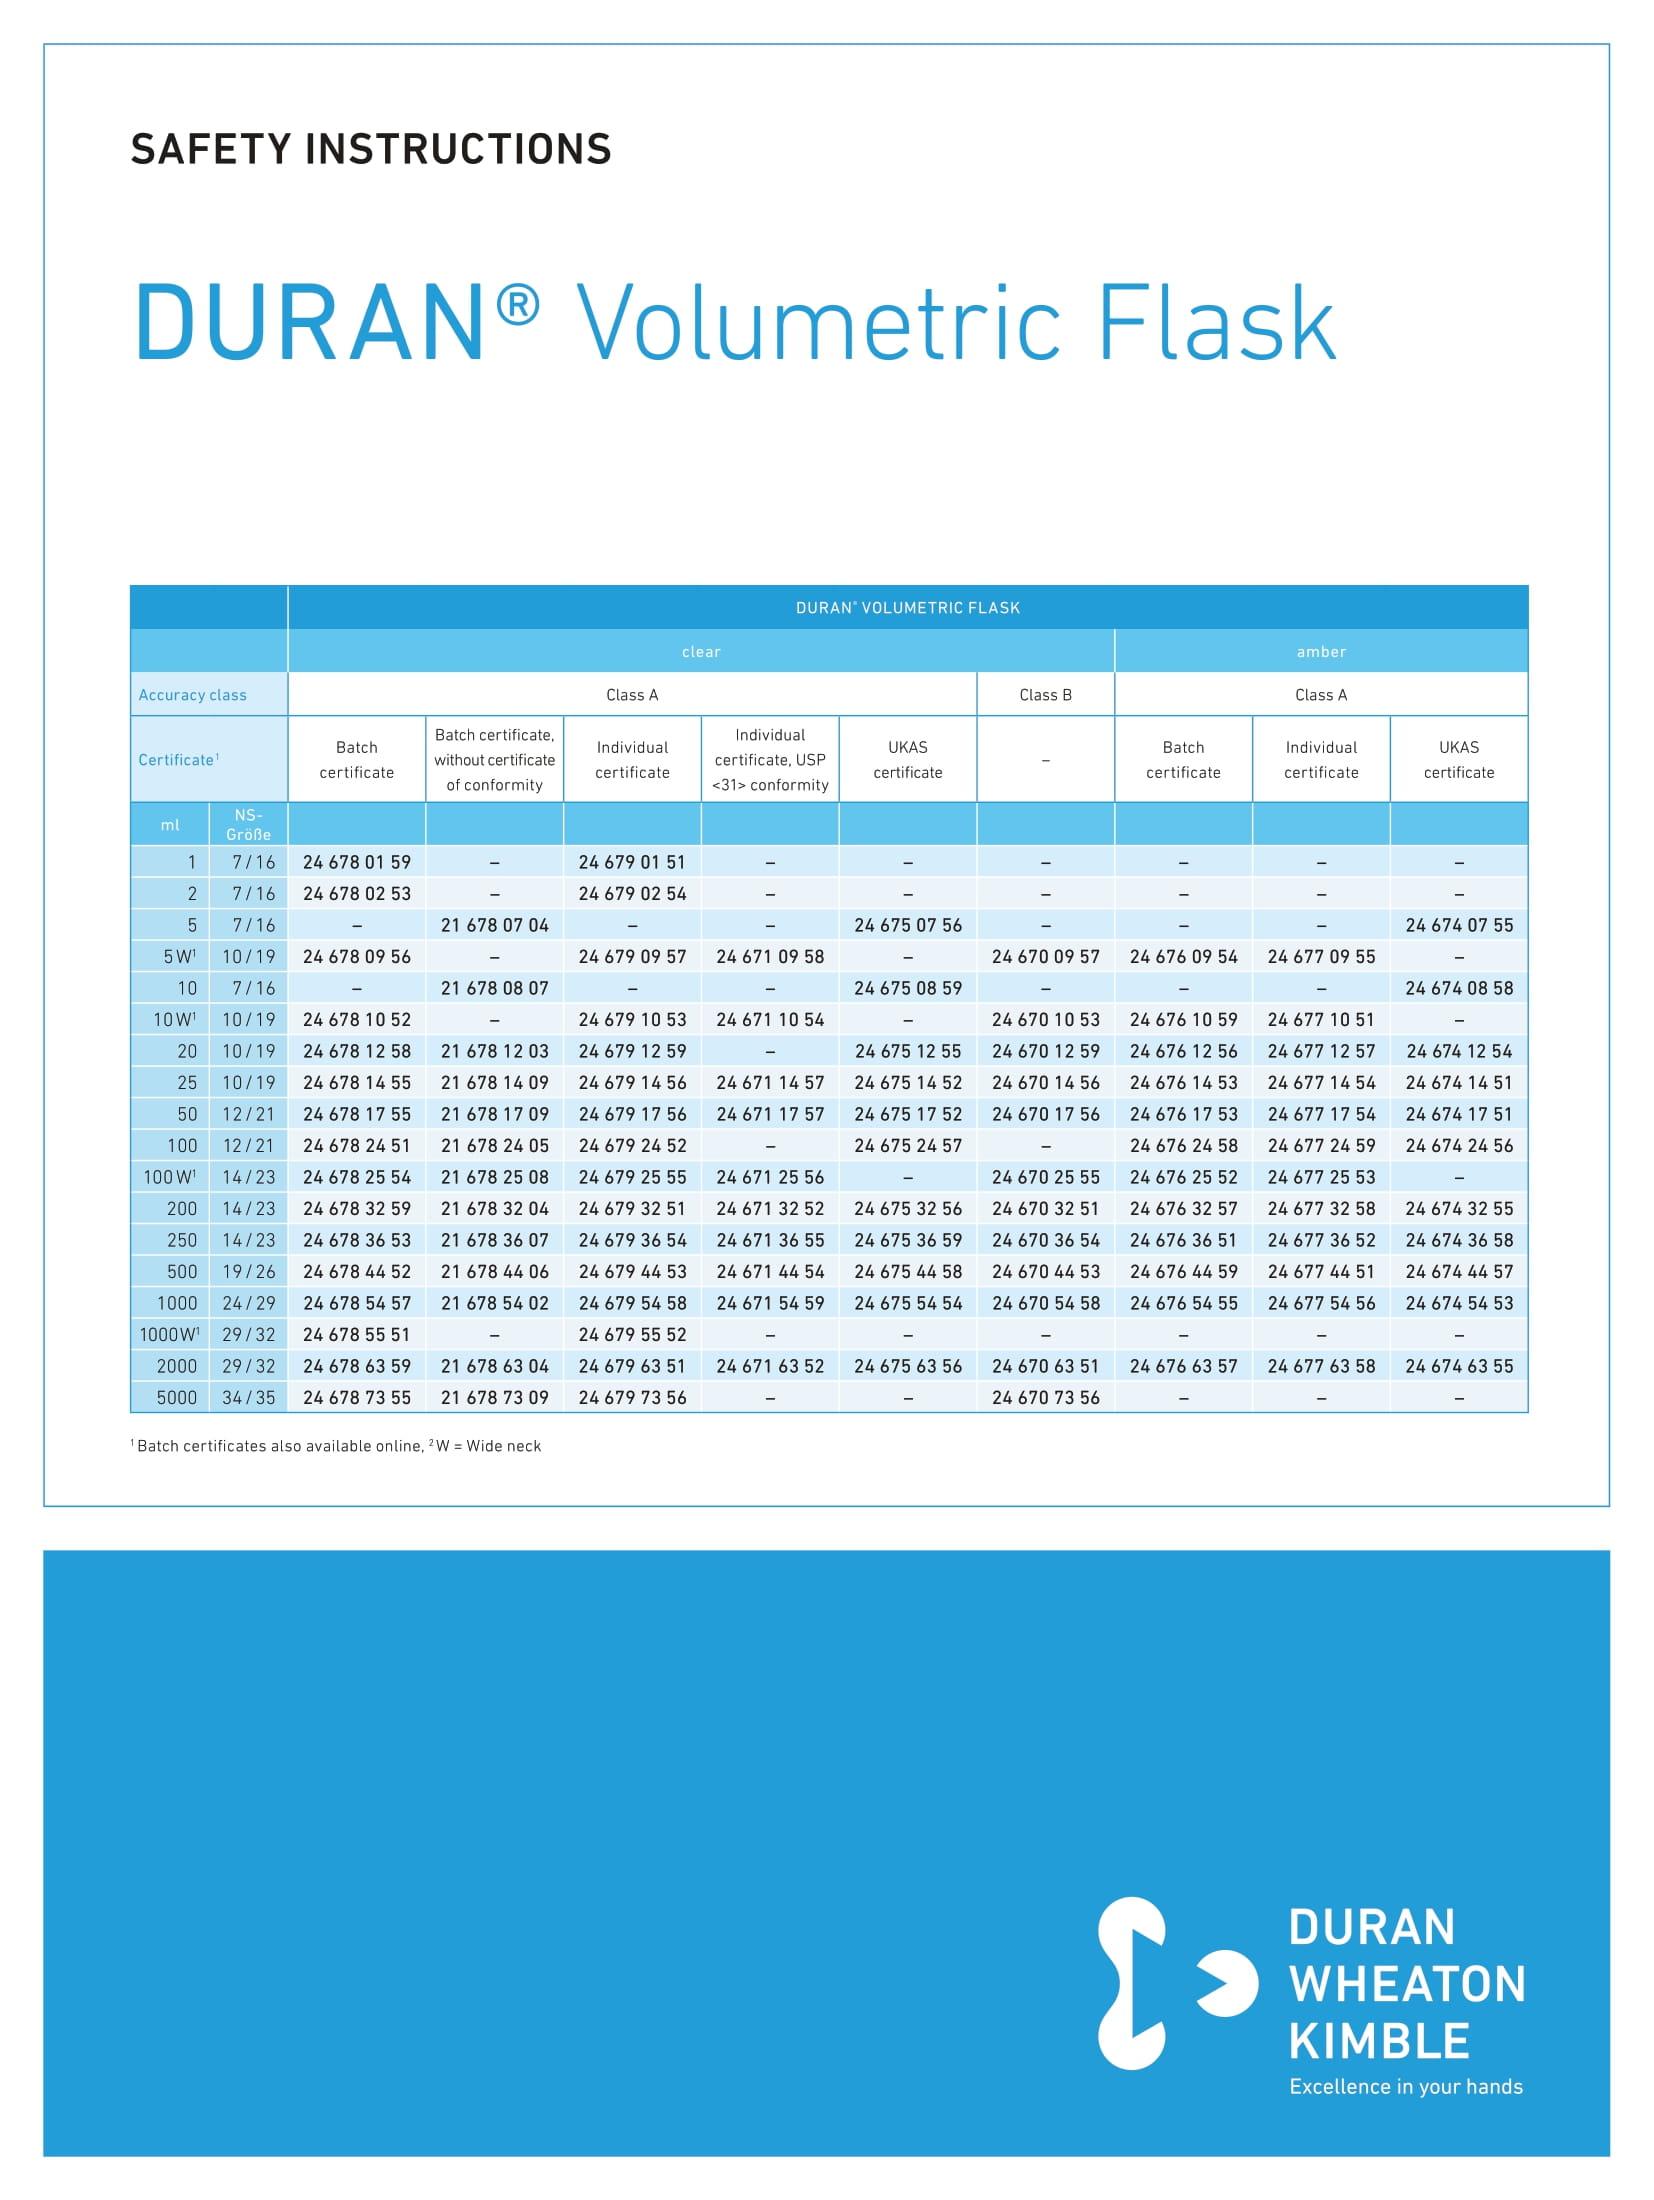 DWK SAFETY INSTRUCTIONS DURAN® Volumetric Flask